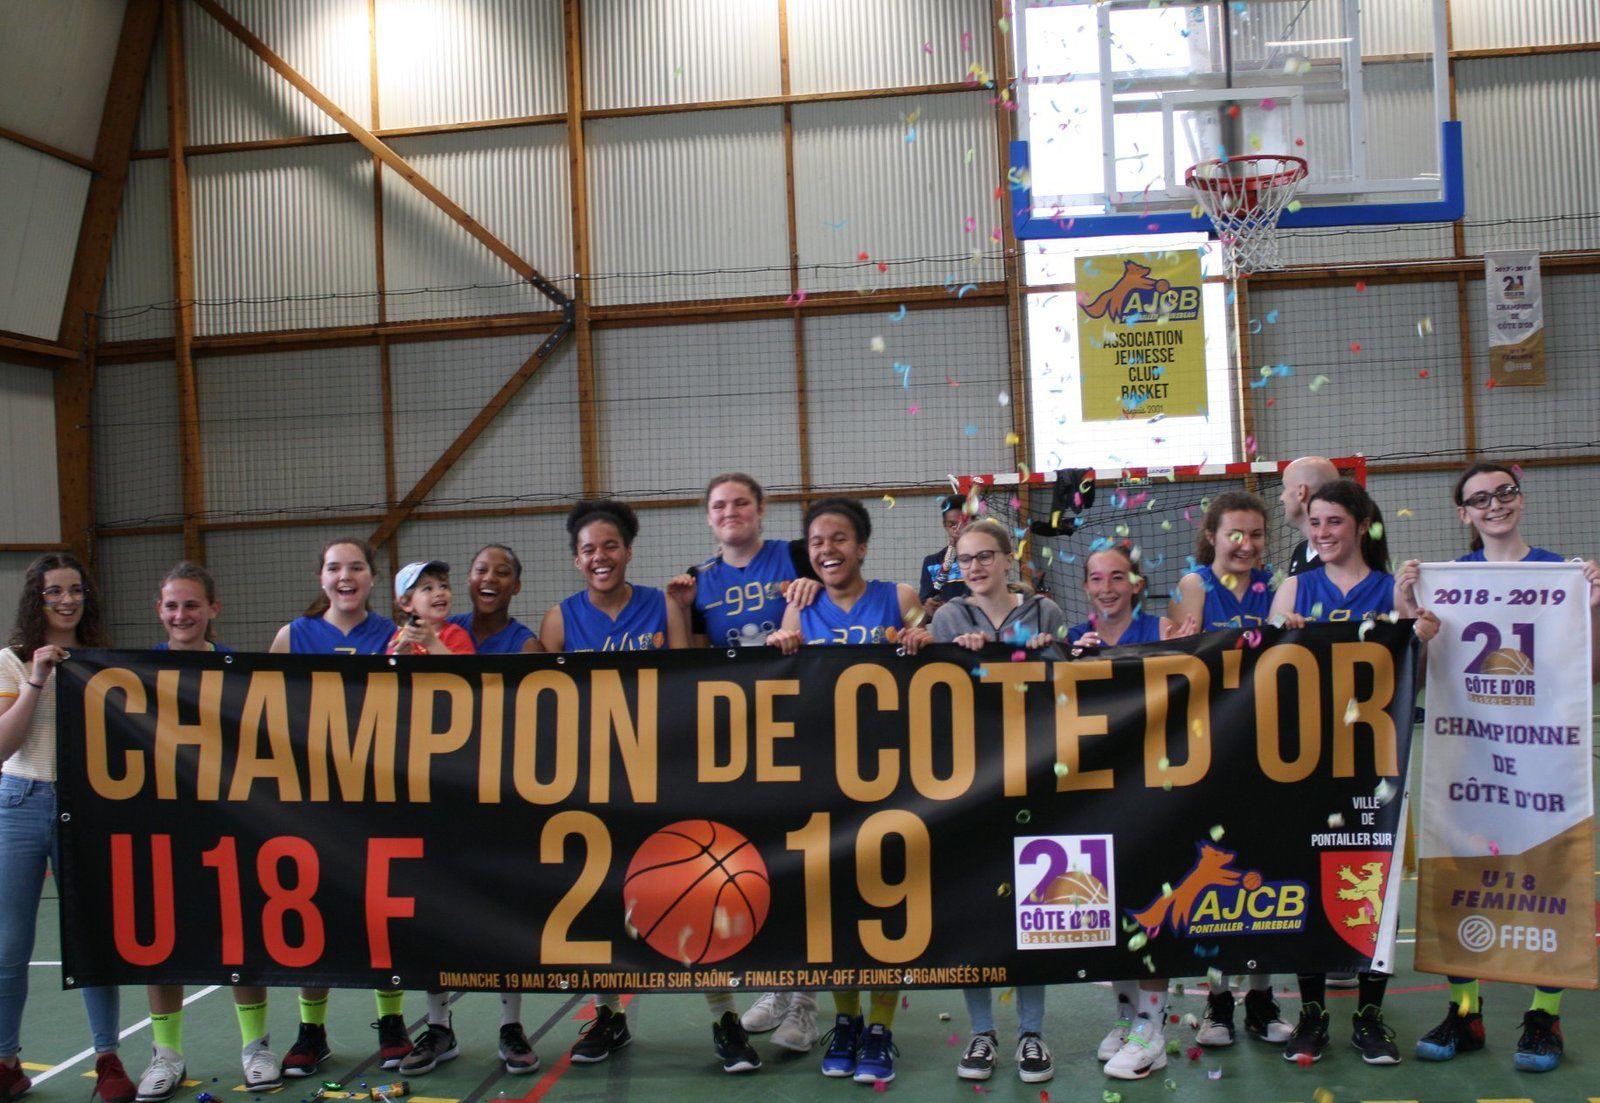 U18F : Chloé, Laura, Léa, Emma, Lara, Loïs, Taïna, Angélina, Chloé, Laurène, Jeanne et Clélia